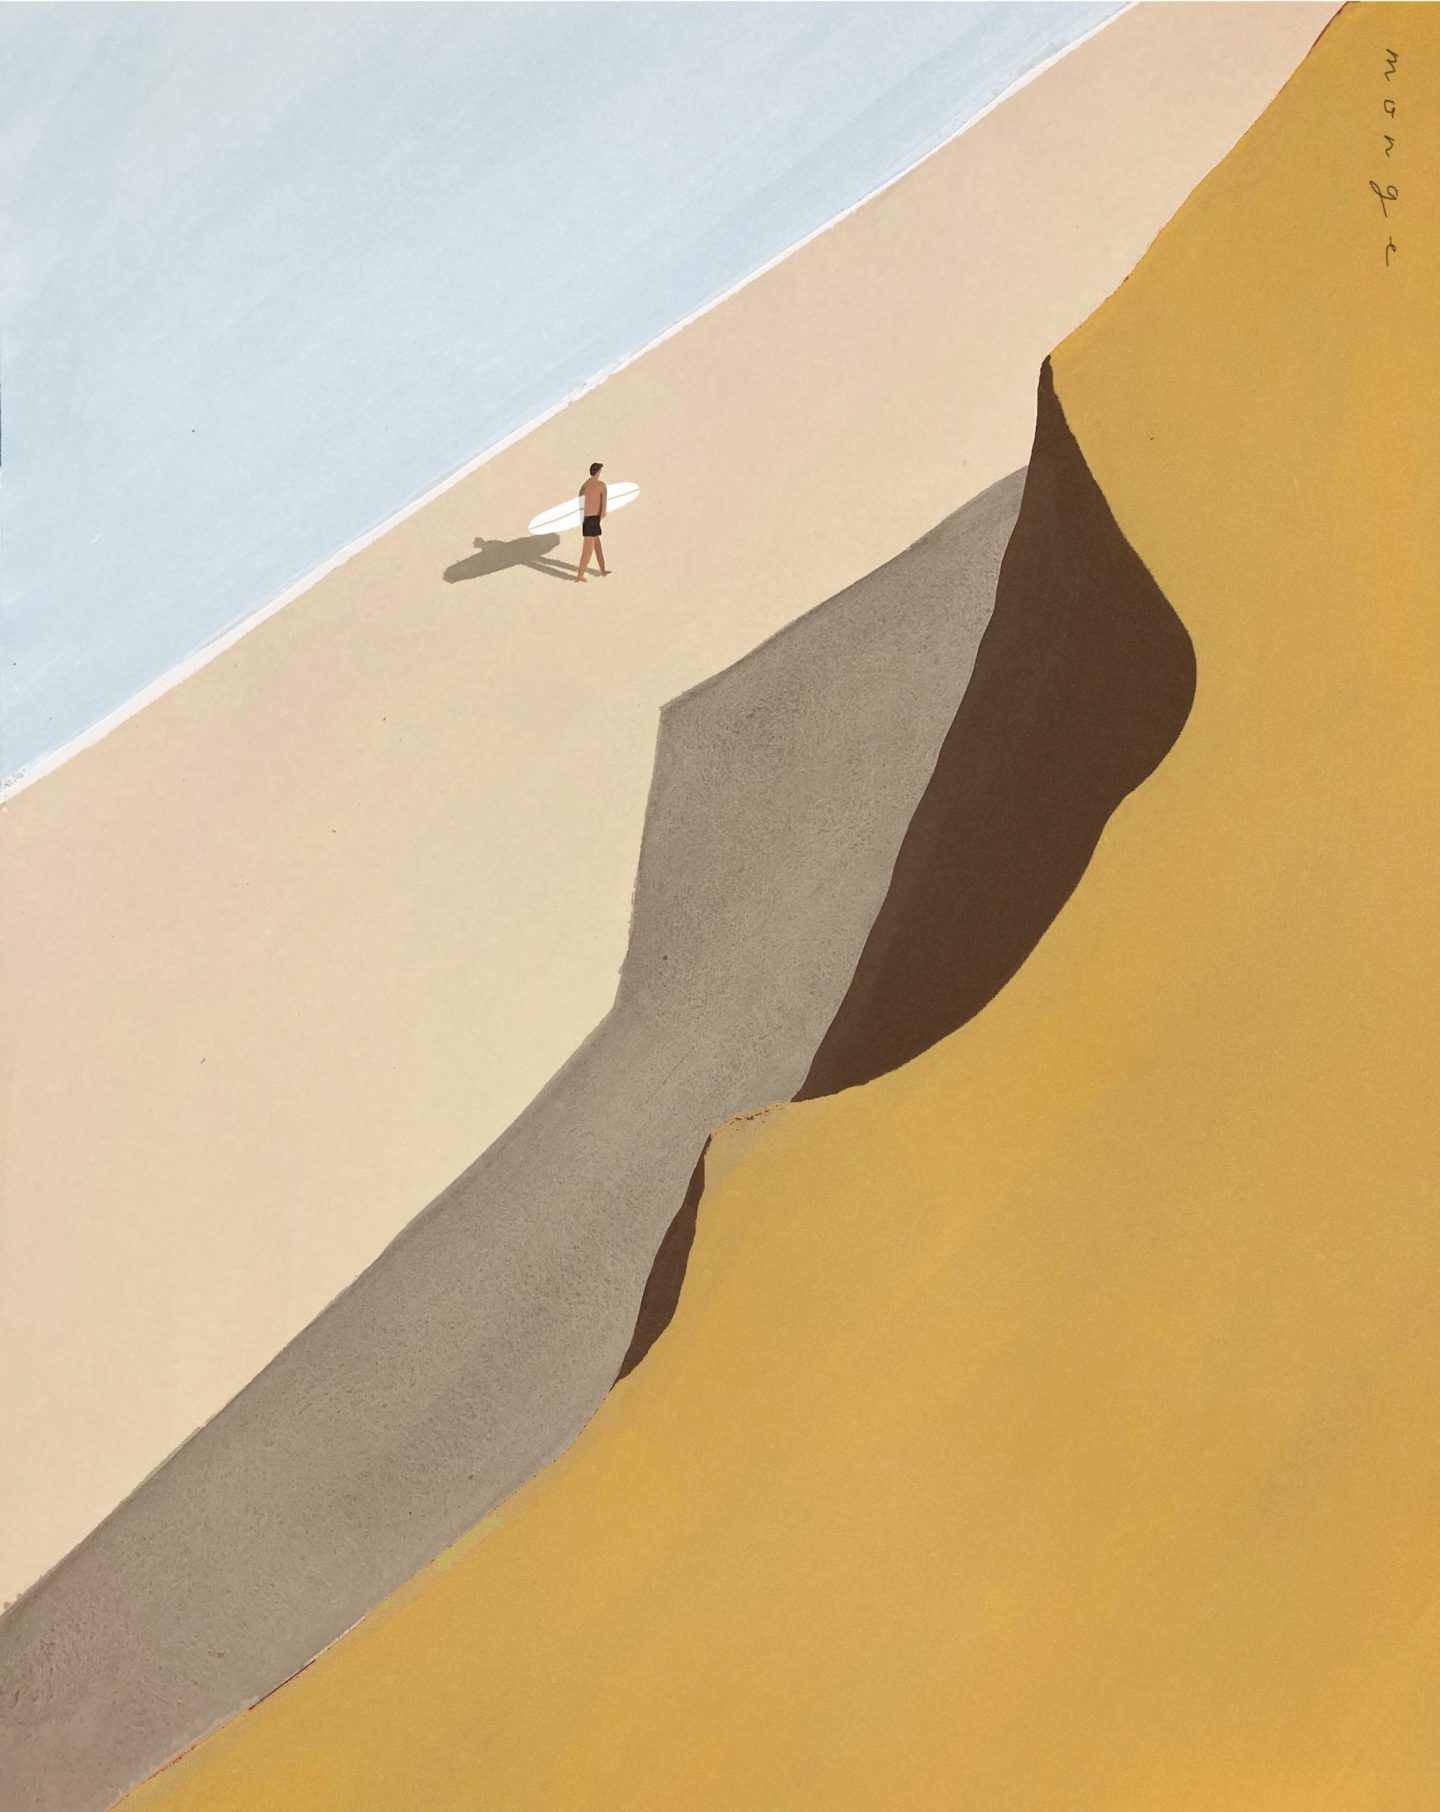 IGNANT-Art-QuentinMonge-4